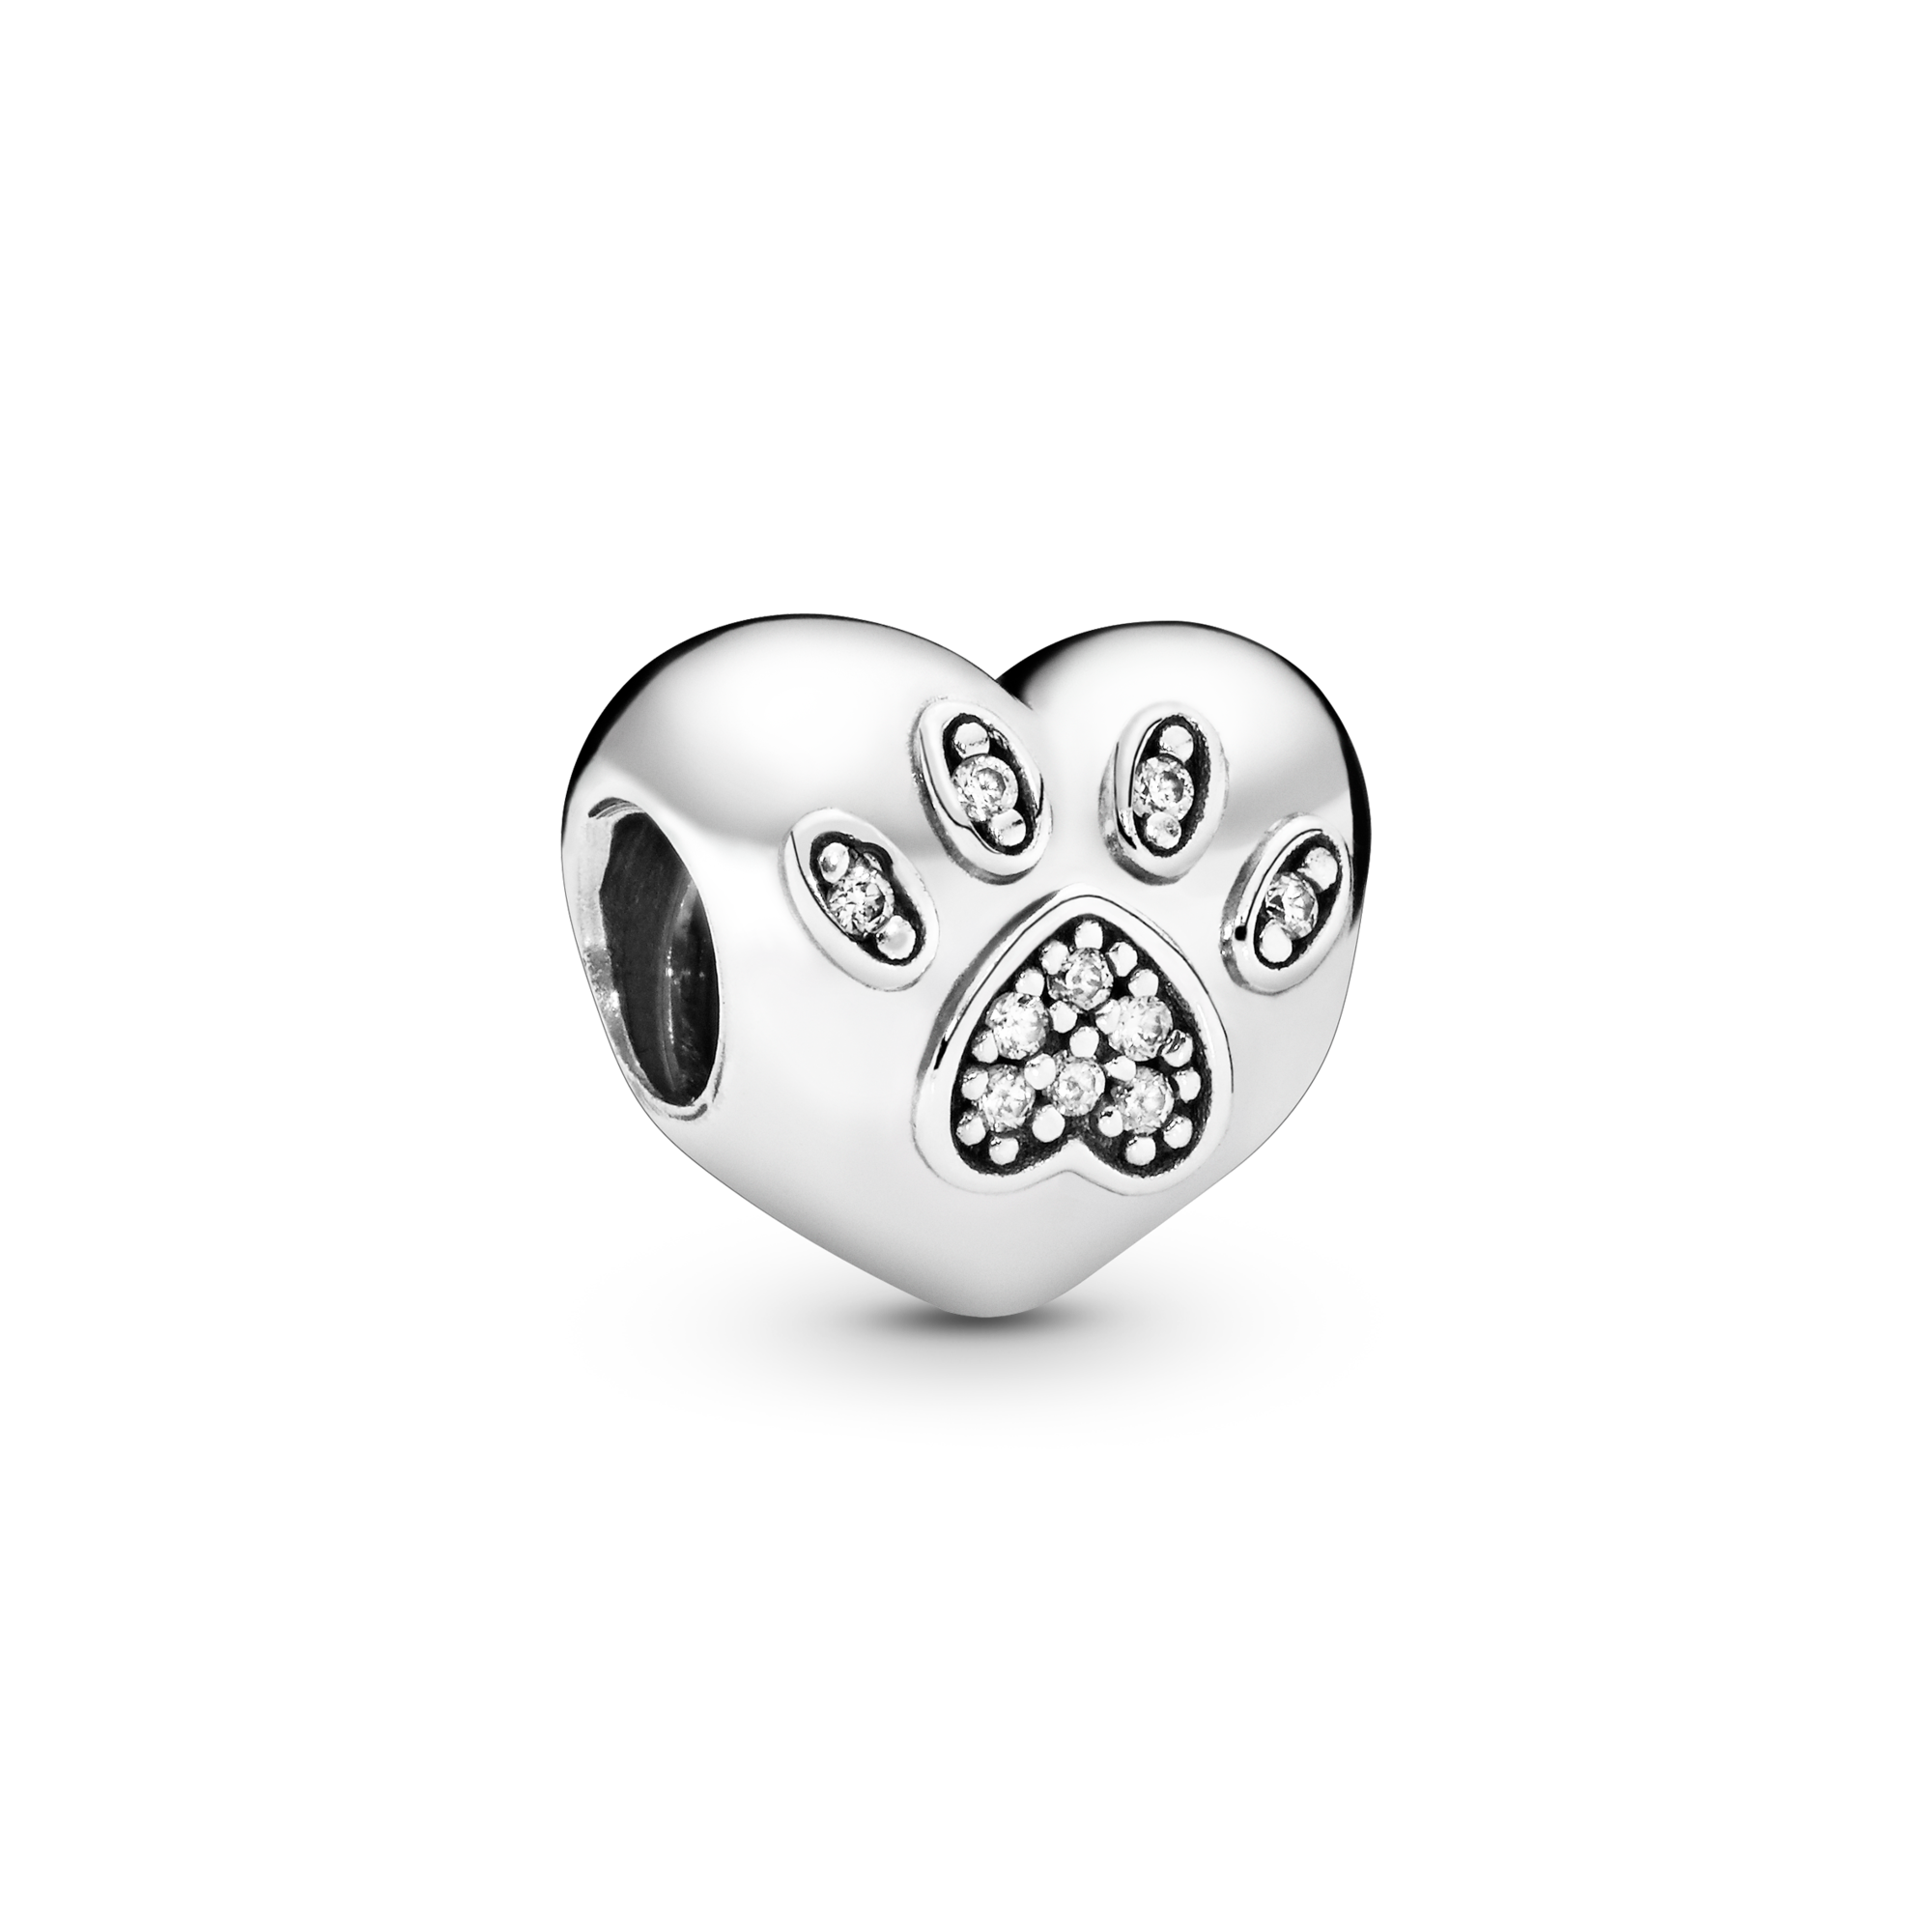 Sterling Silver Small Heart Charm Fit European Bracelet #94081